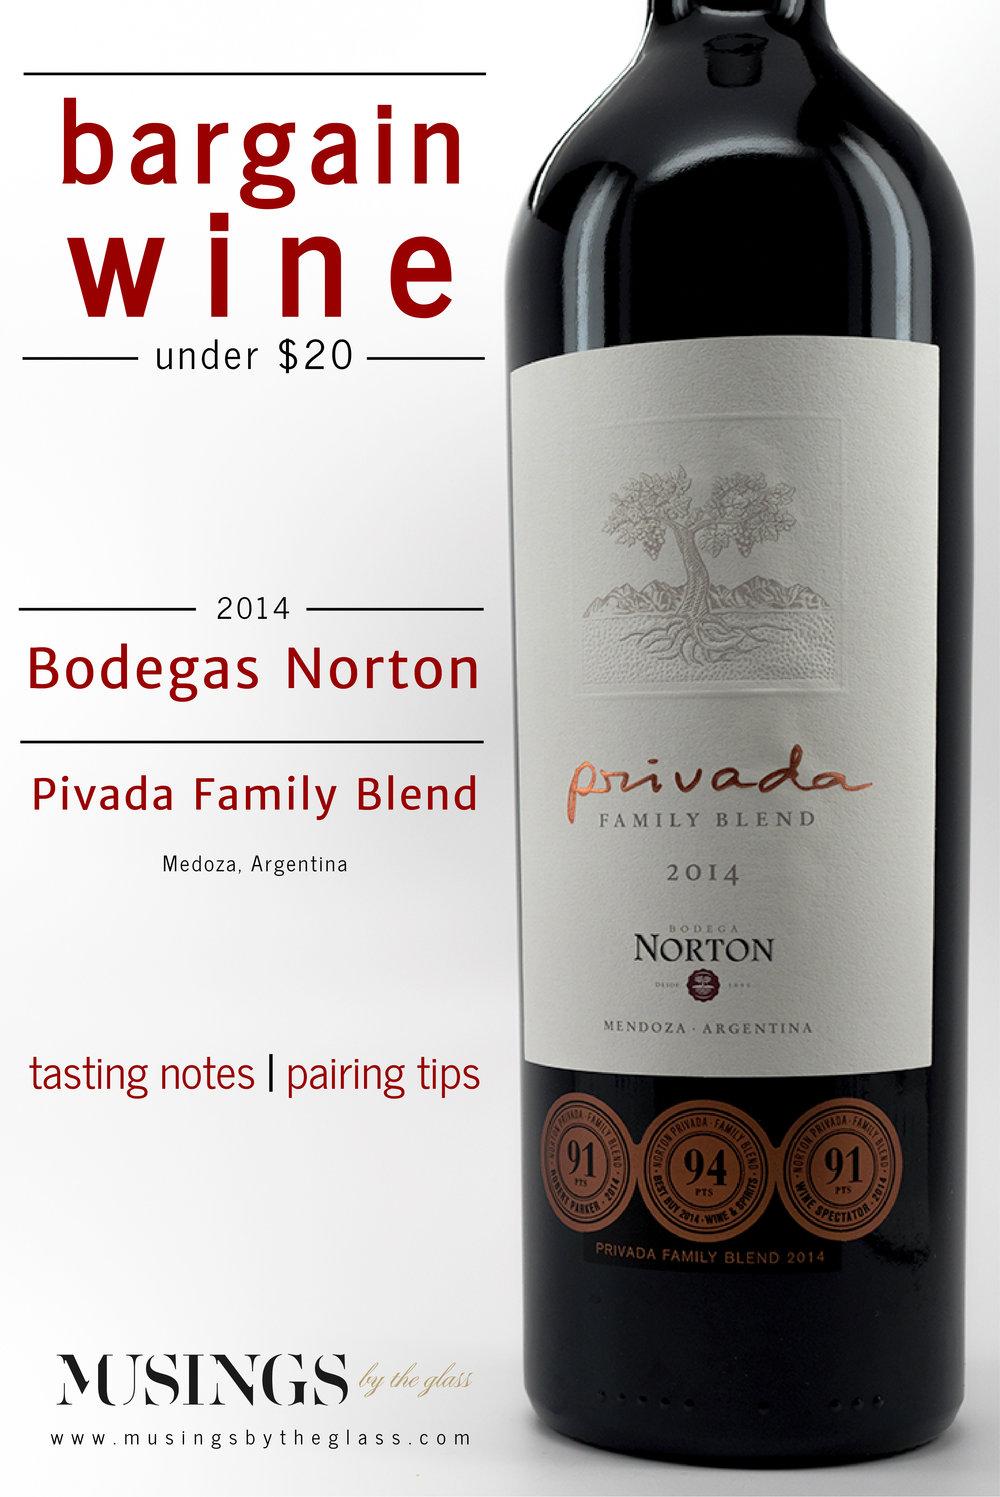 Musings by the Glass - Bargain Wines - Bodegas Norton Privada Family Blend (Malbec, Merlot, Cabernet Sauvignon) from Mendoza, Argentina